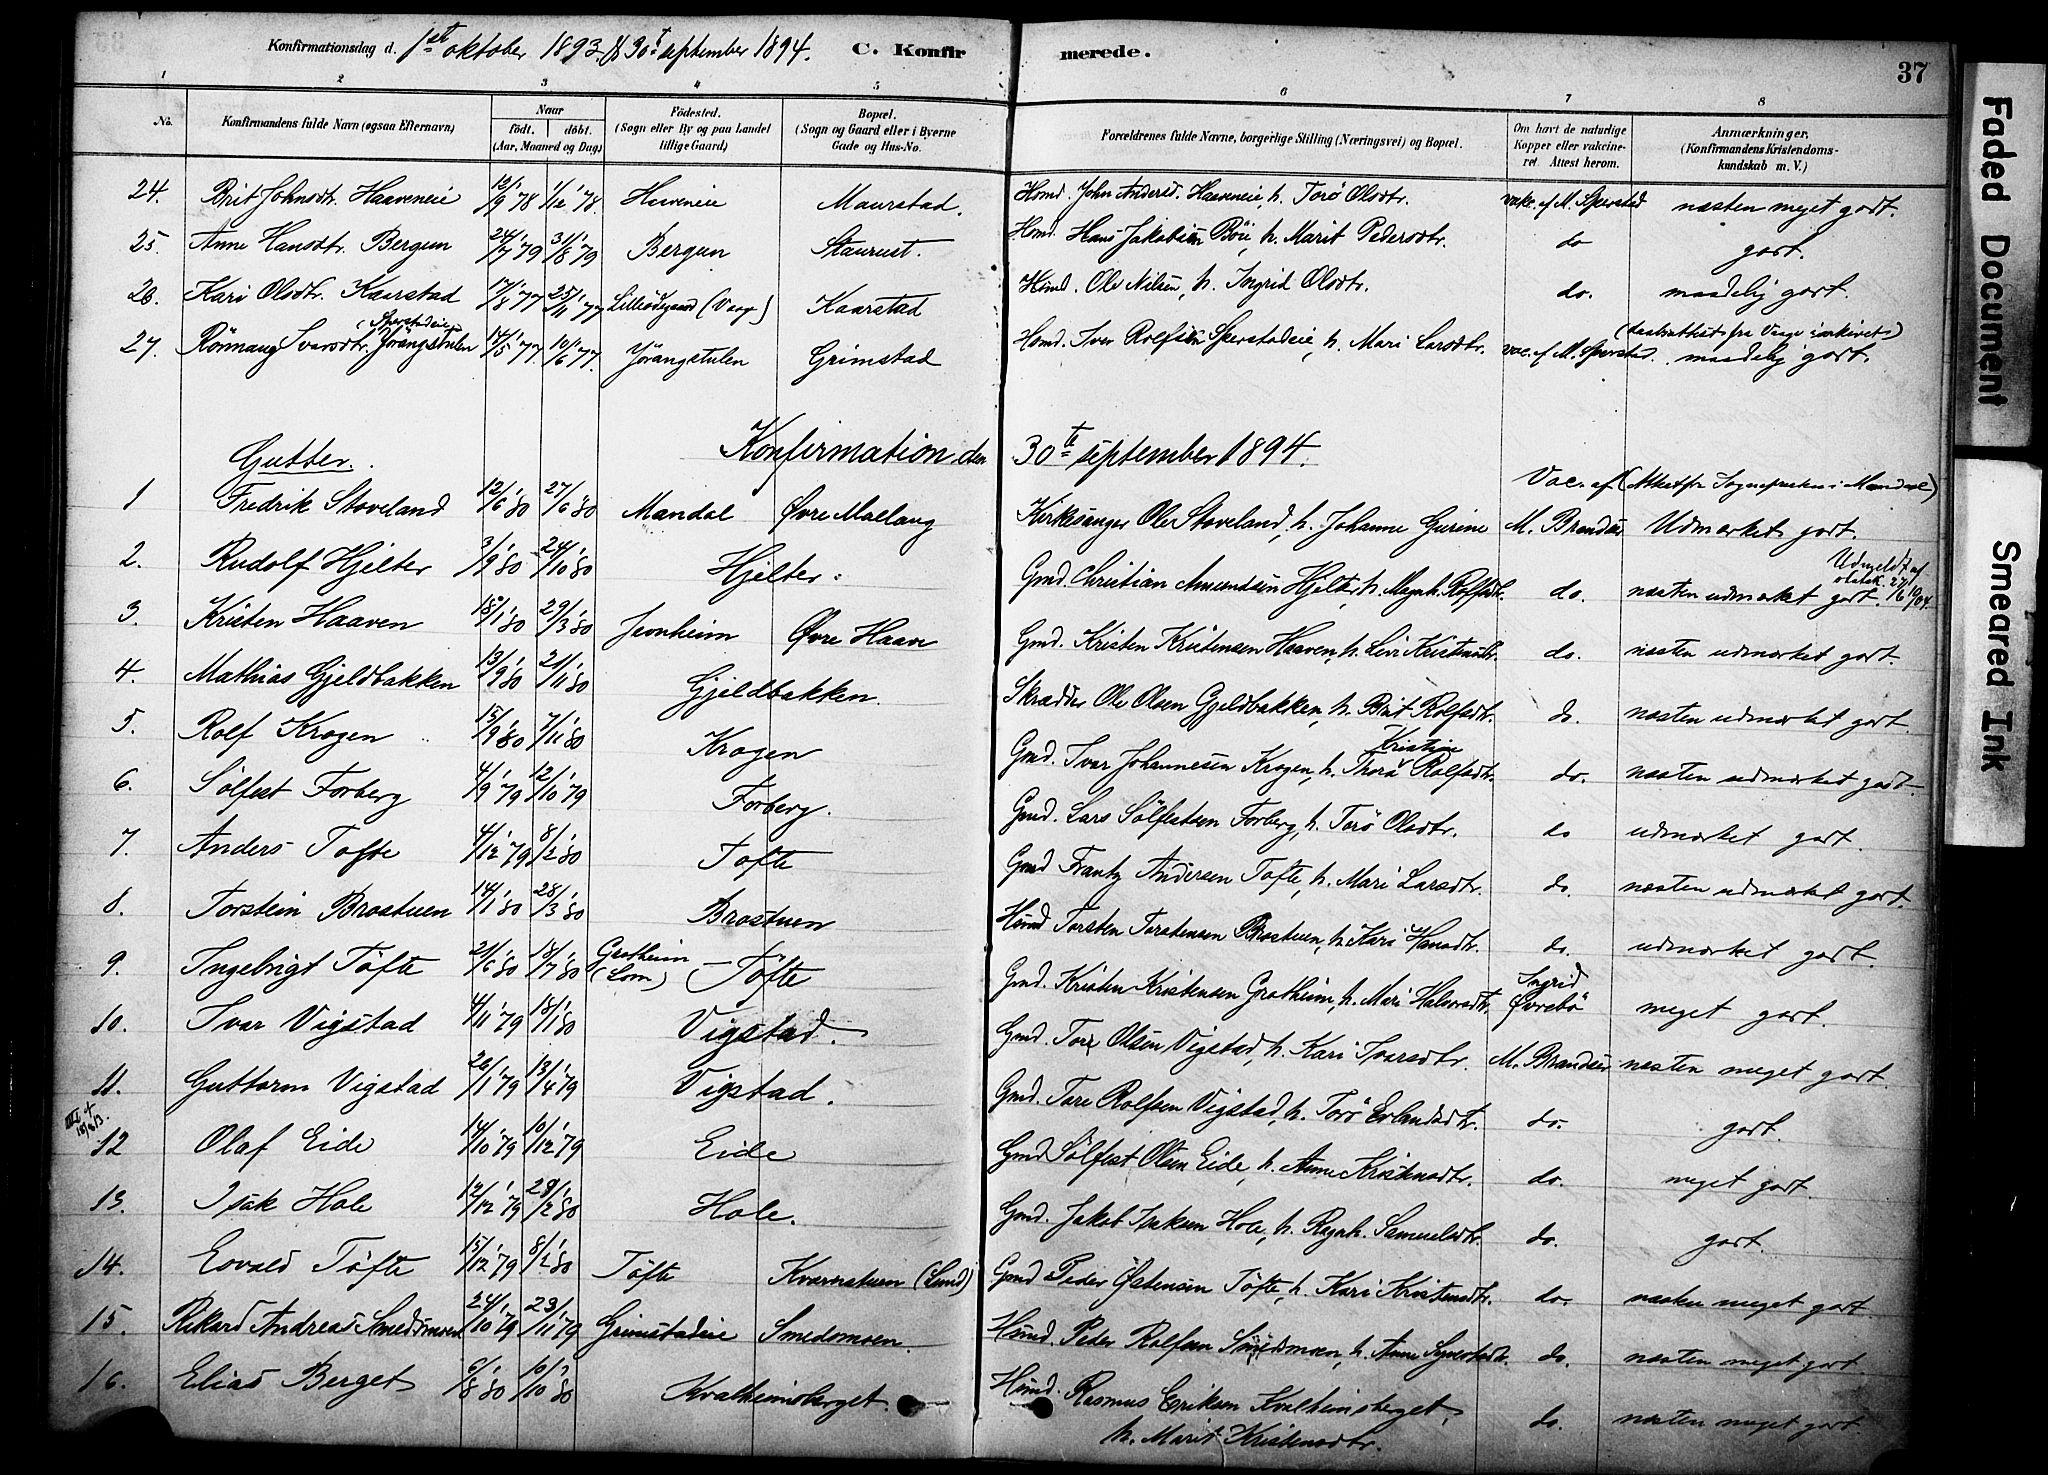 SAH, Skjåk prestekontor, Ministerialbok nr. 2, 1878-1907, s. 37